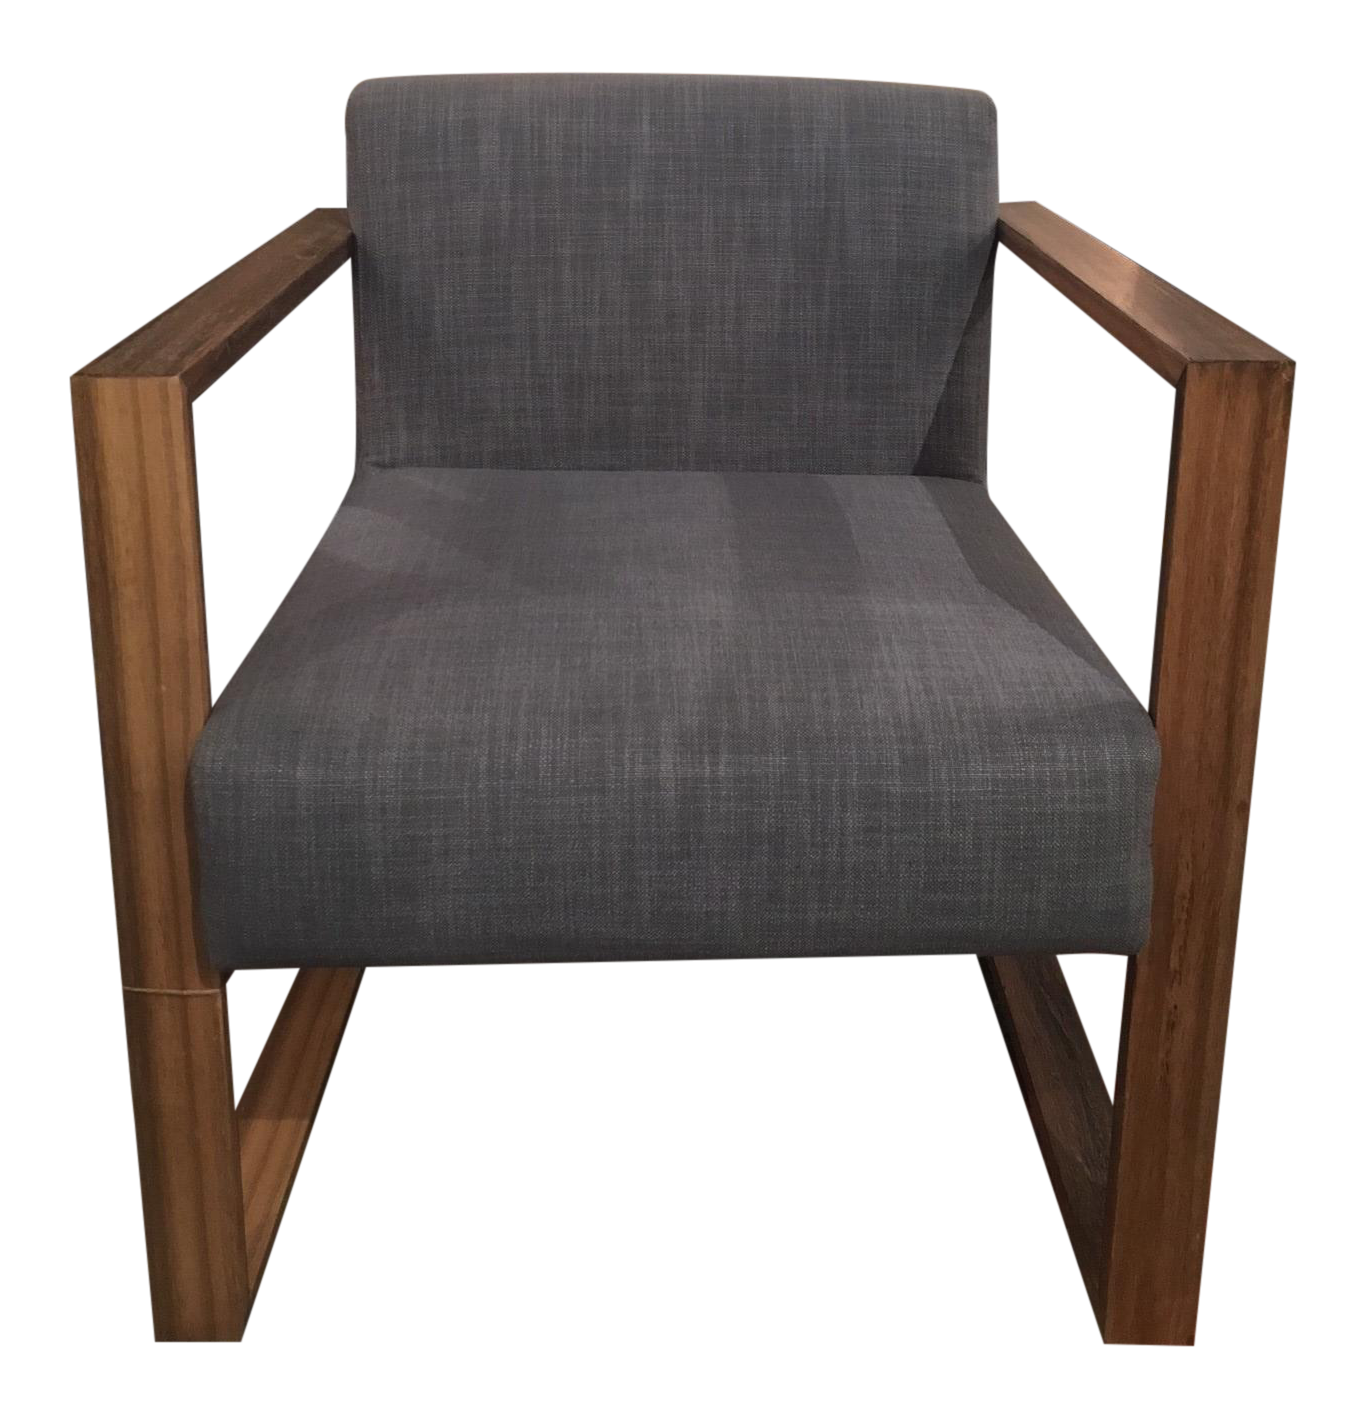 Ollin Lounge Chair By Taracea Furniture Company